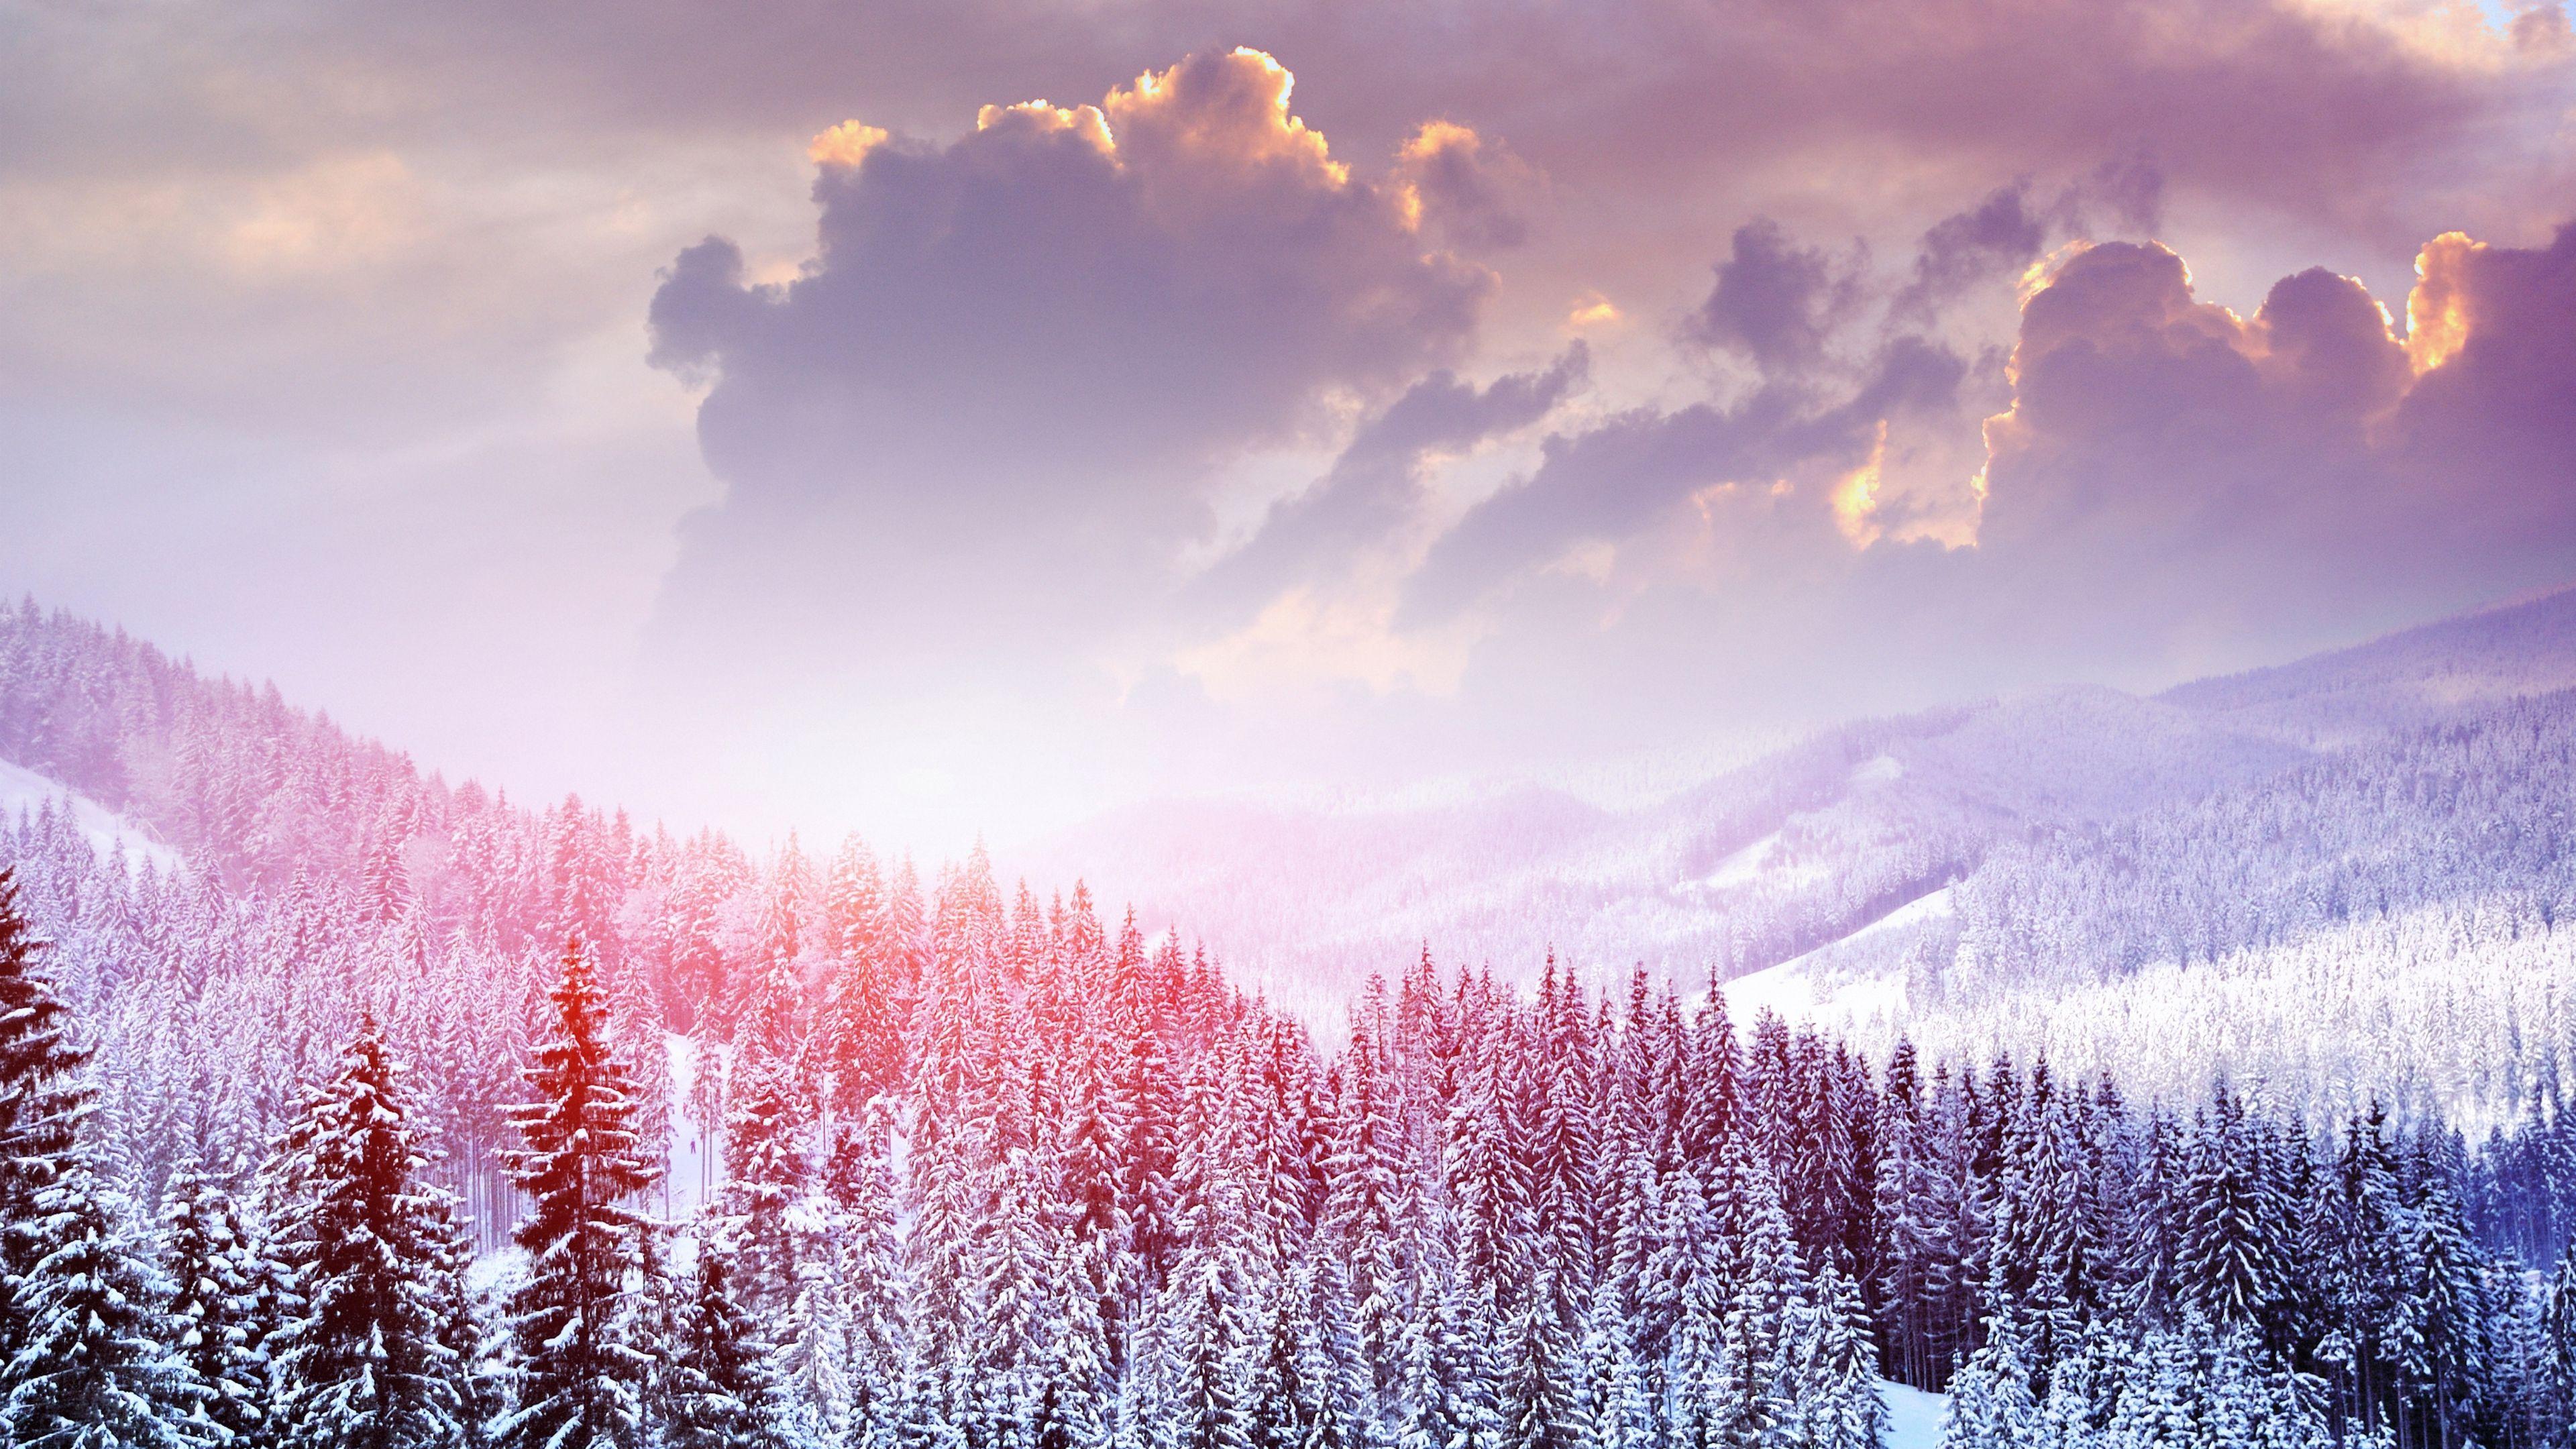 Ultra Hd Wallpaper 3840x2160 Landscape Winter Snow Trees